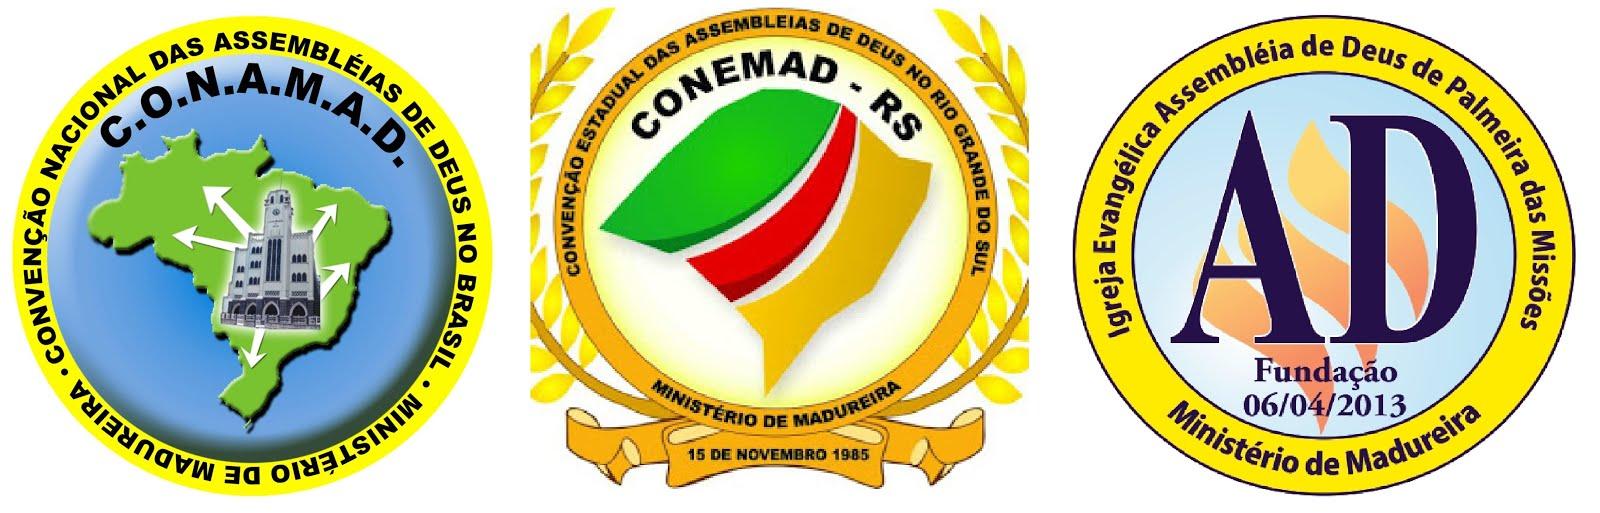 CONAMAD - CONEMAD/RS - IEADEMMAD